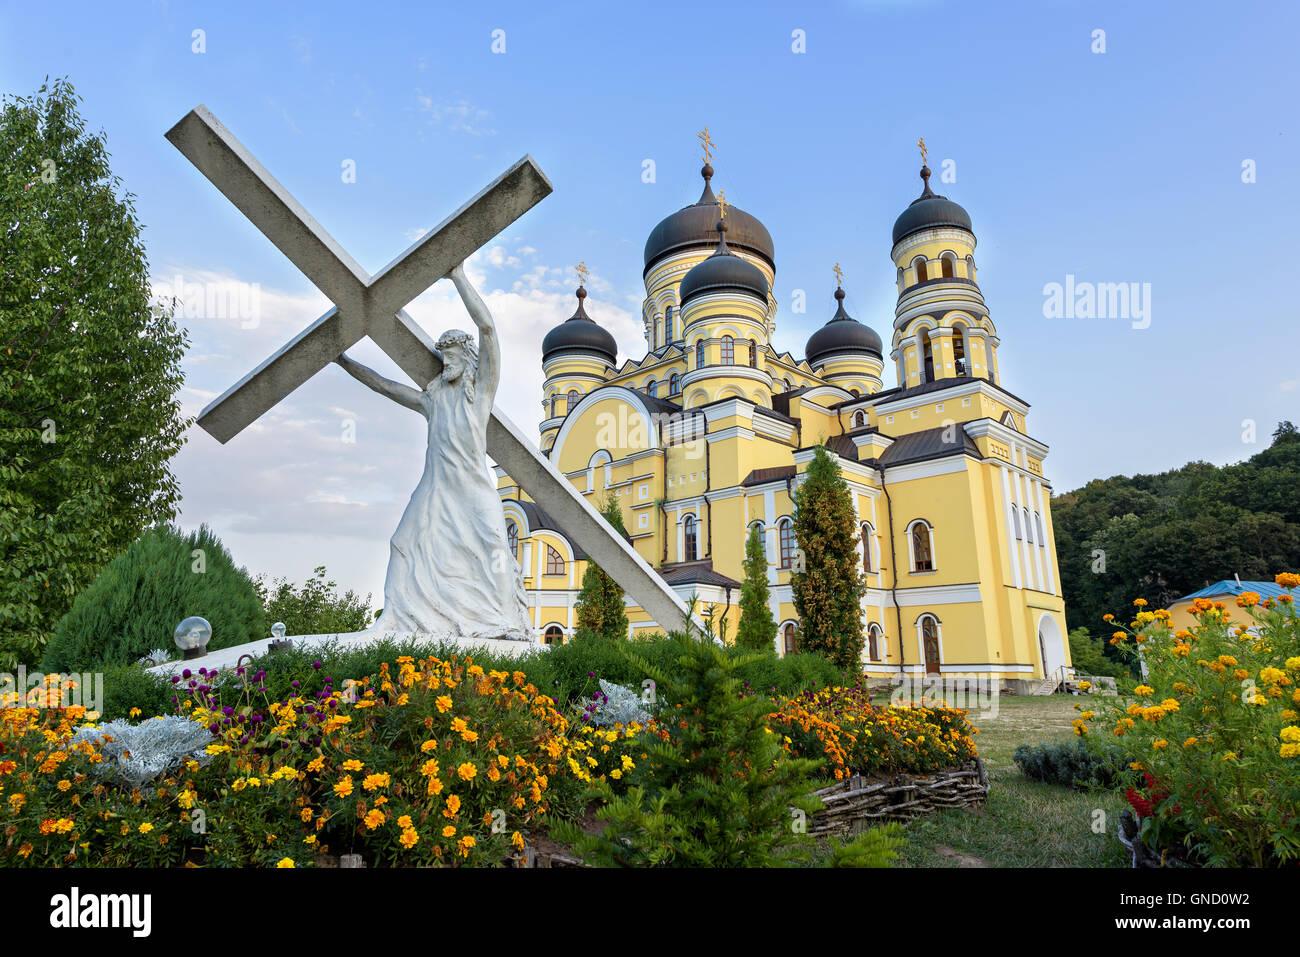 Photo of Hancu Monastery in Moldova - Stock Image